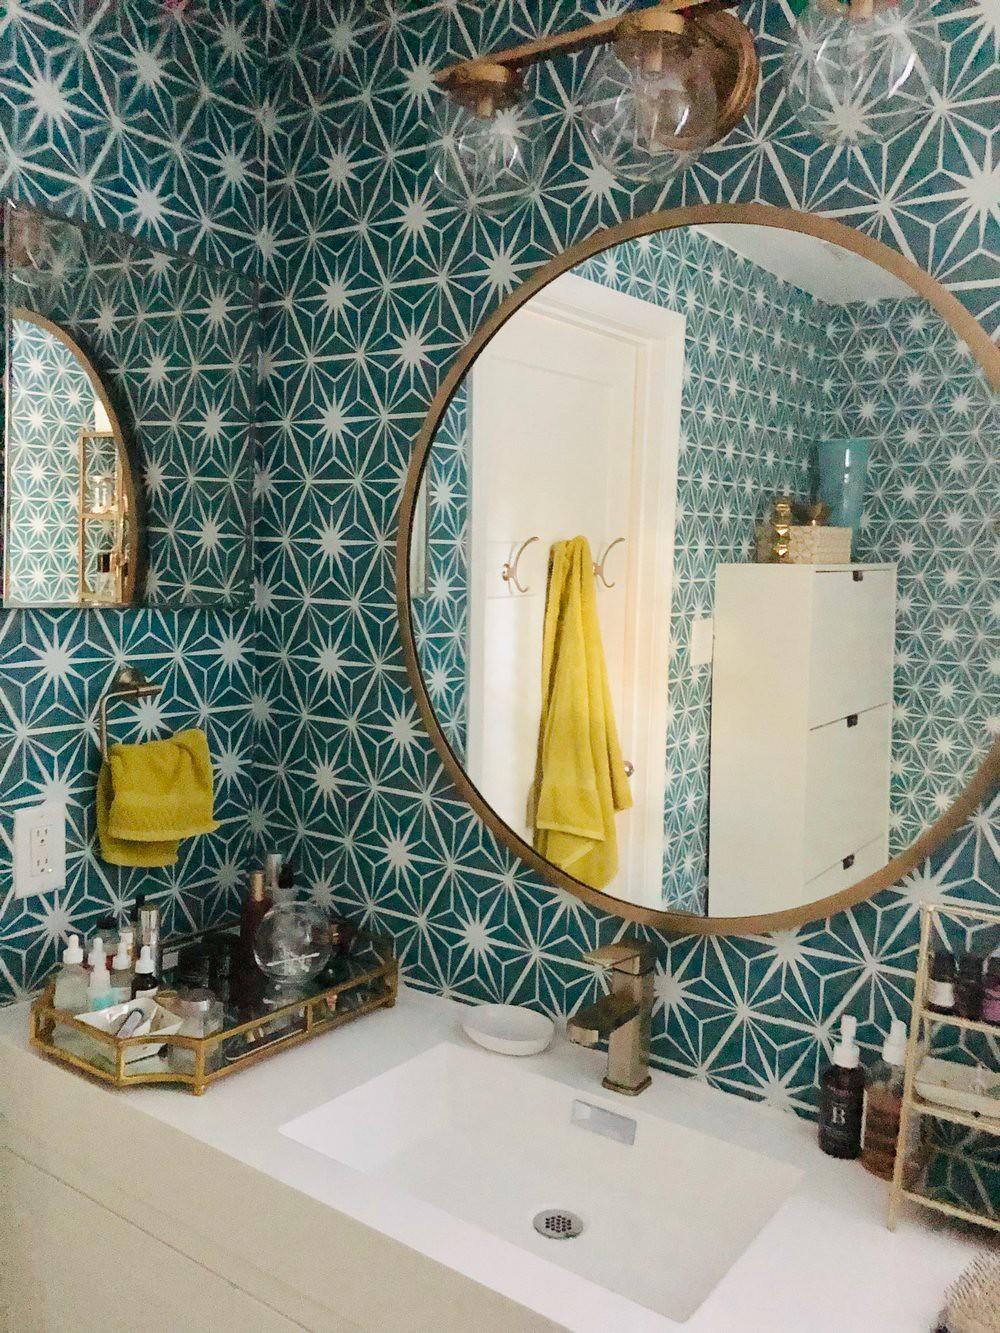 Green Teal Blue Starburst Wallpaper | Temporary Wallpaper Ideas | Peel and Stick Wallpapered Bathroom Inspiration